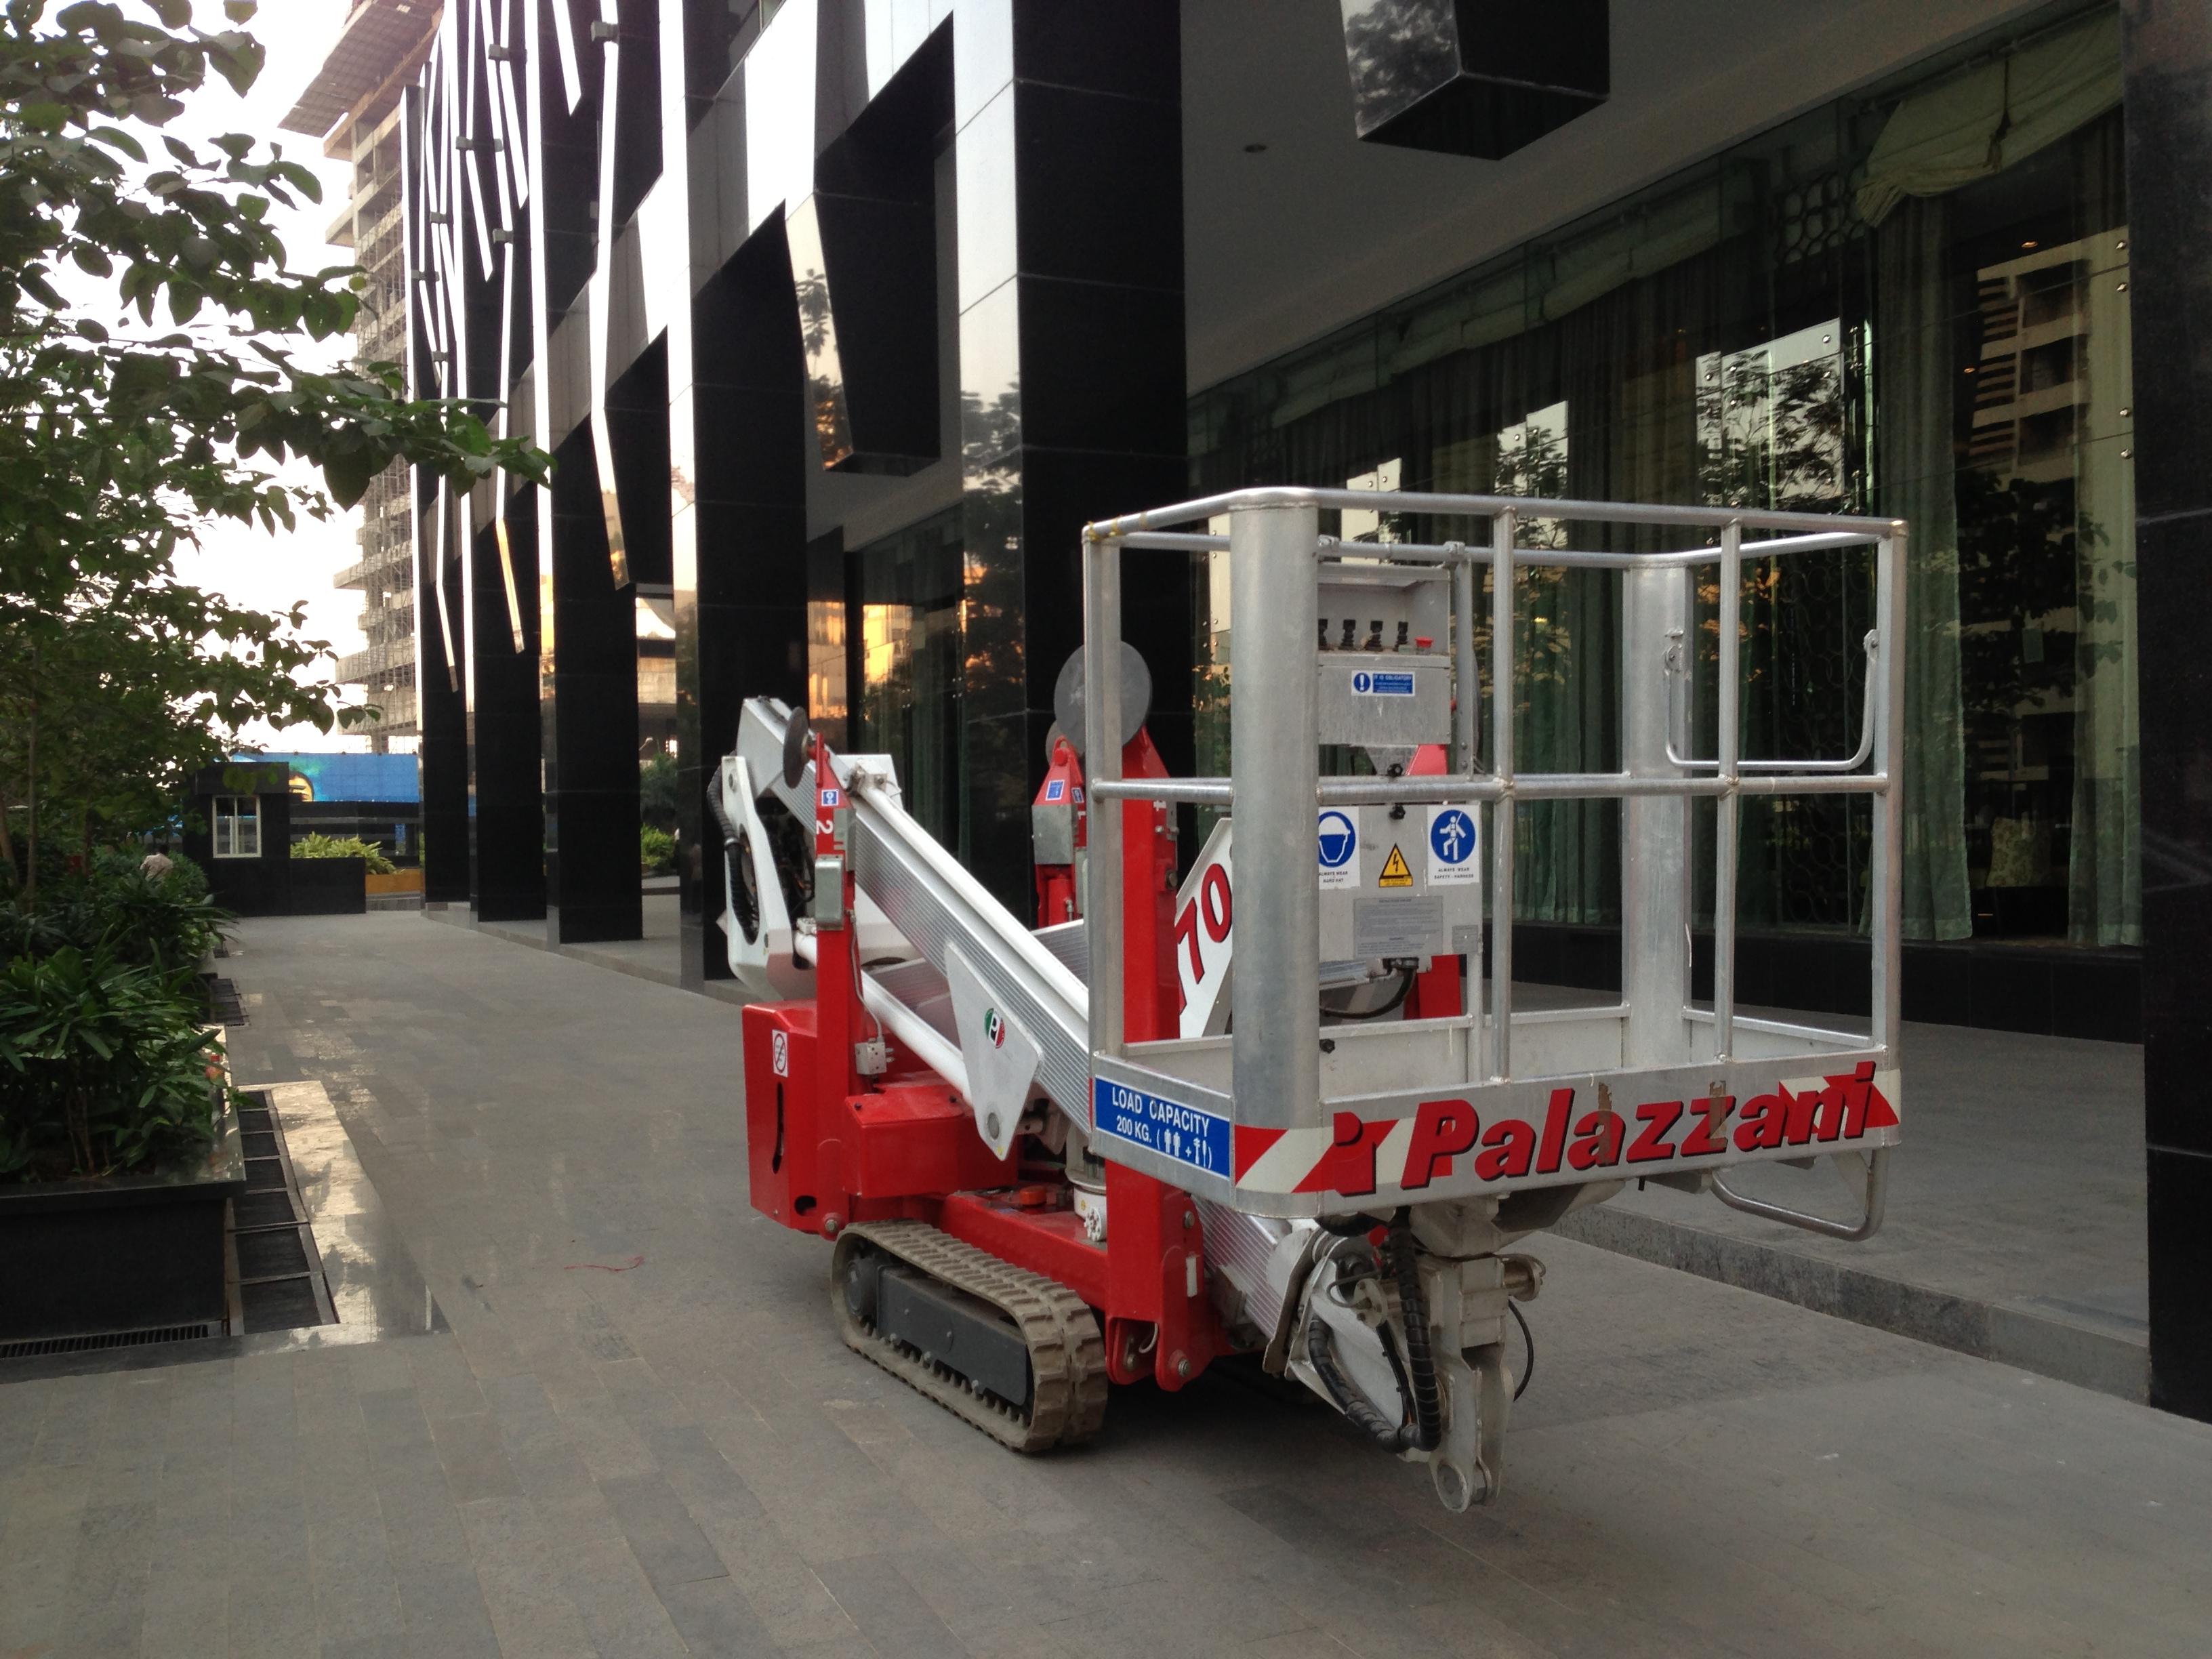 A 21m truck mounted platform allows an operator to access a telecoms tower